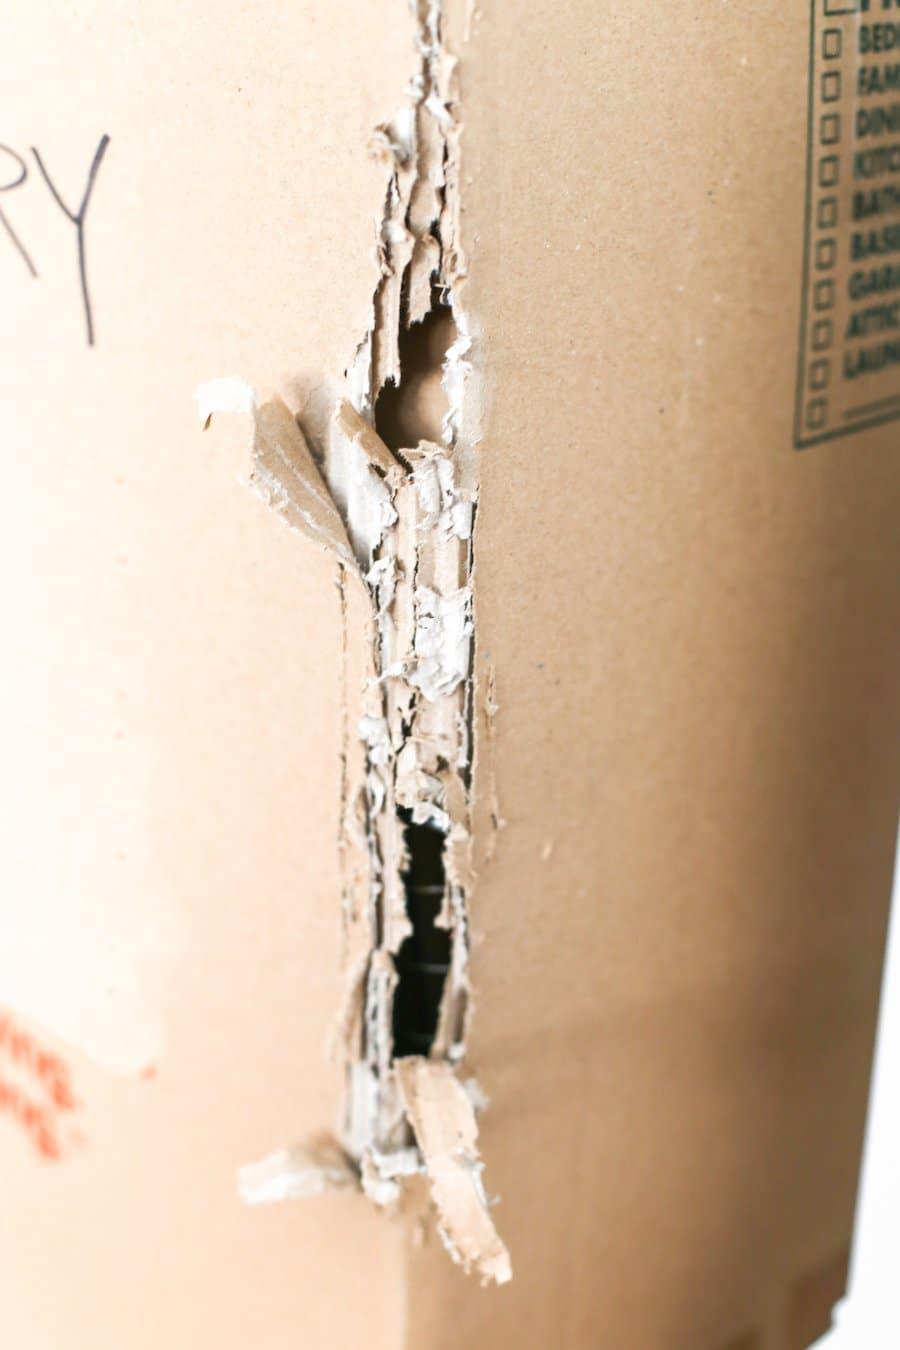 Diy cardboard cat scratcher salty canary for Diy cat tower cardboard